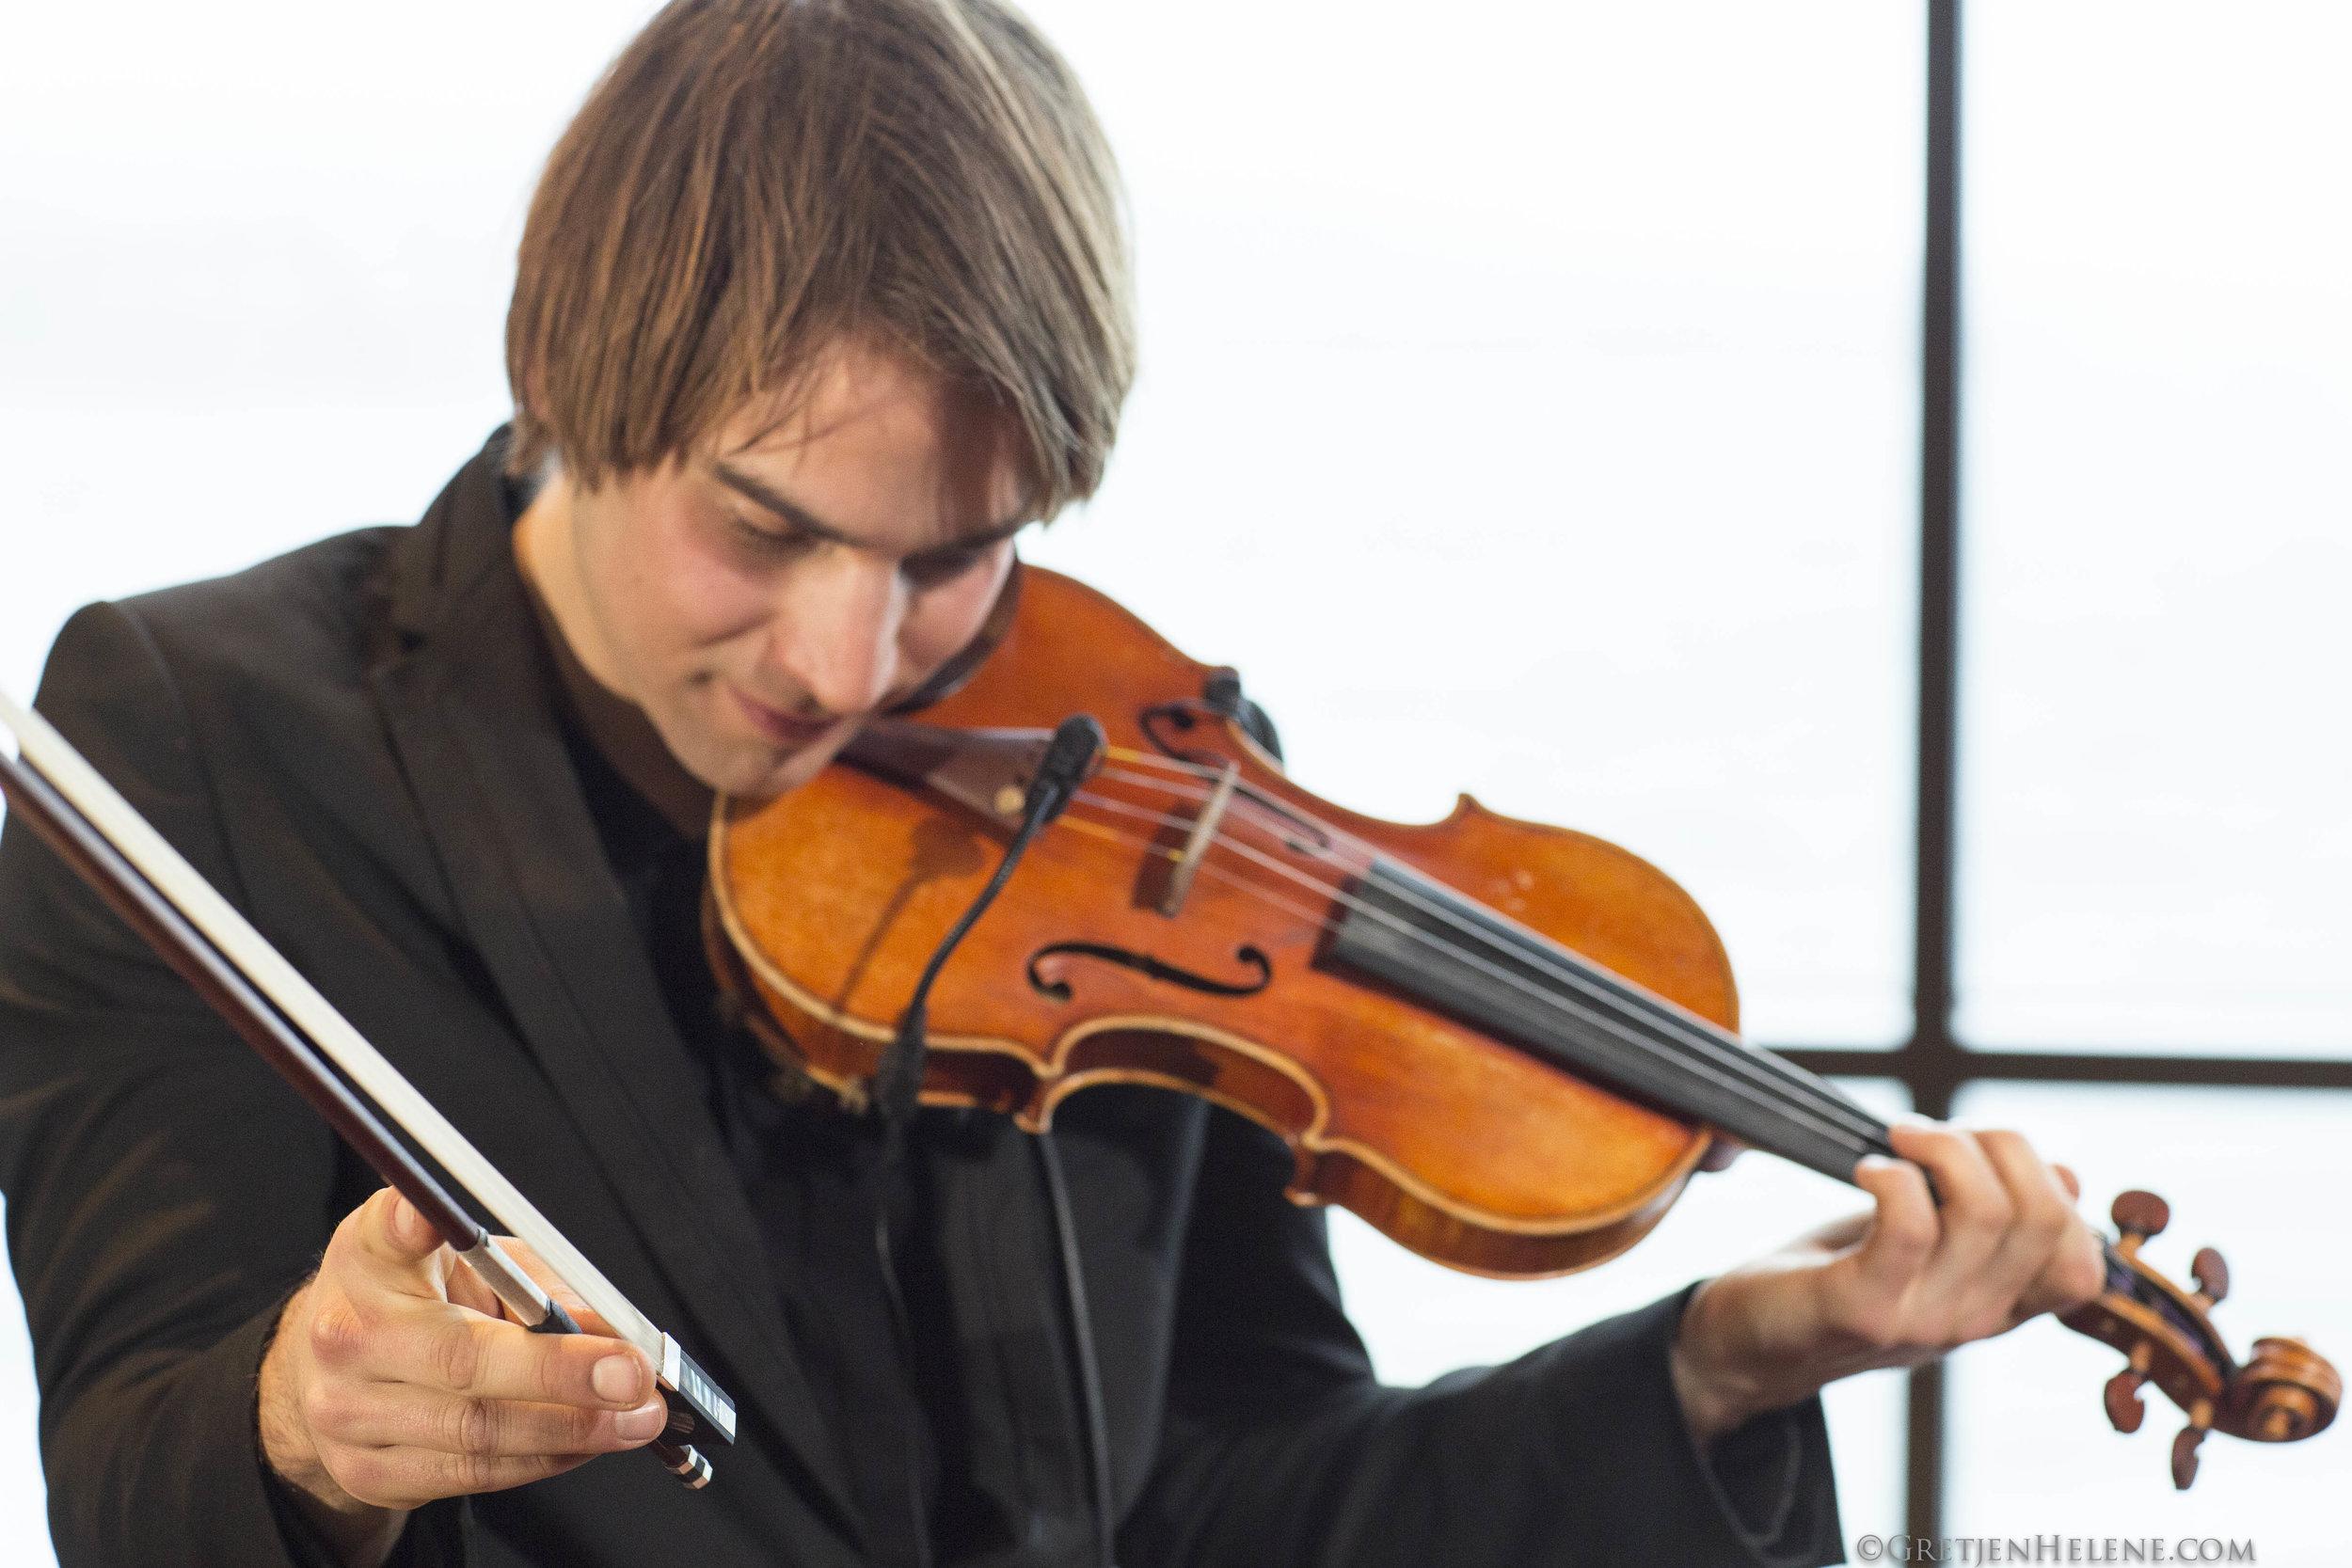 Guy Mendilow Ensemble - Chris Baum - Photo by Gretjen Helene - 300dpi